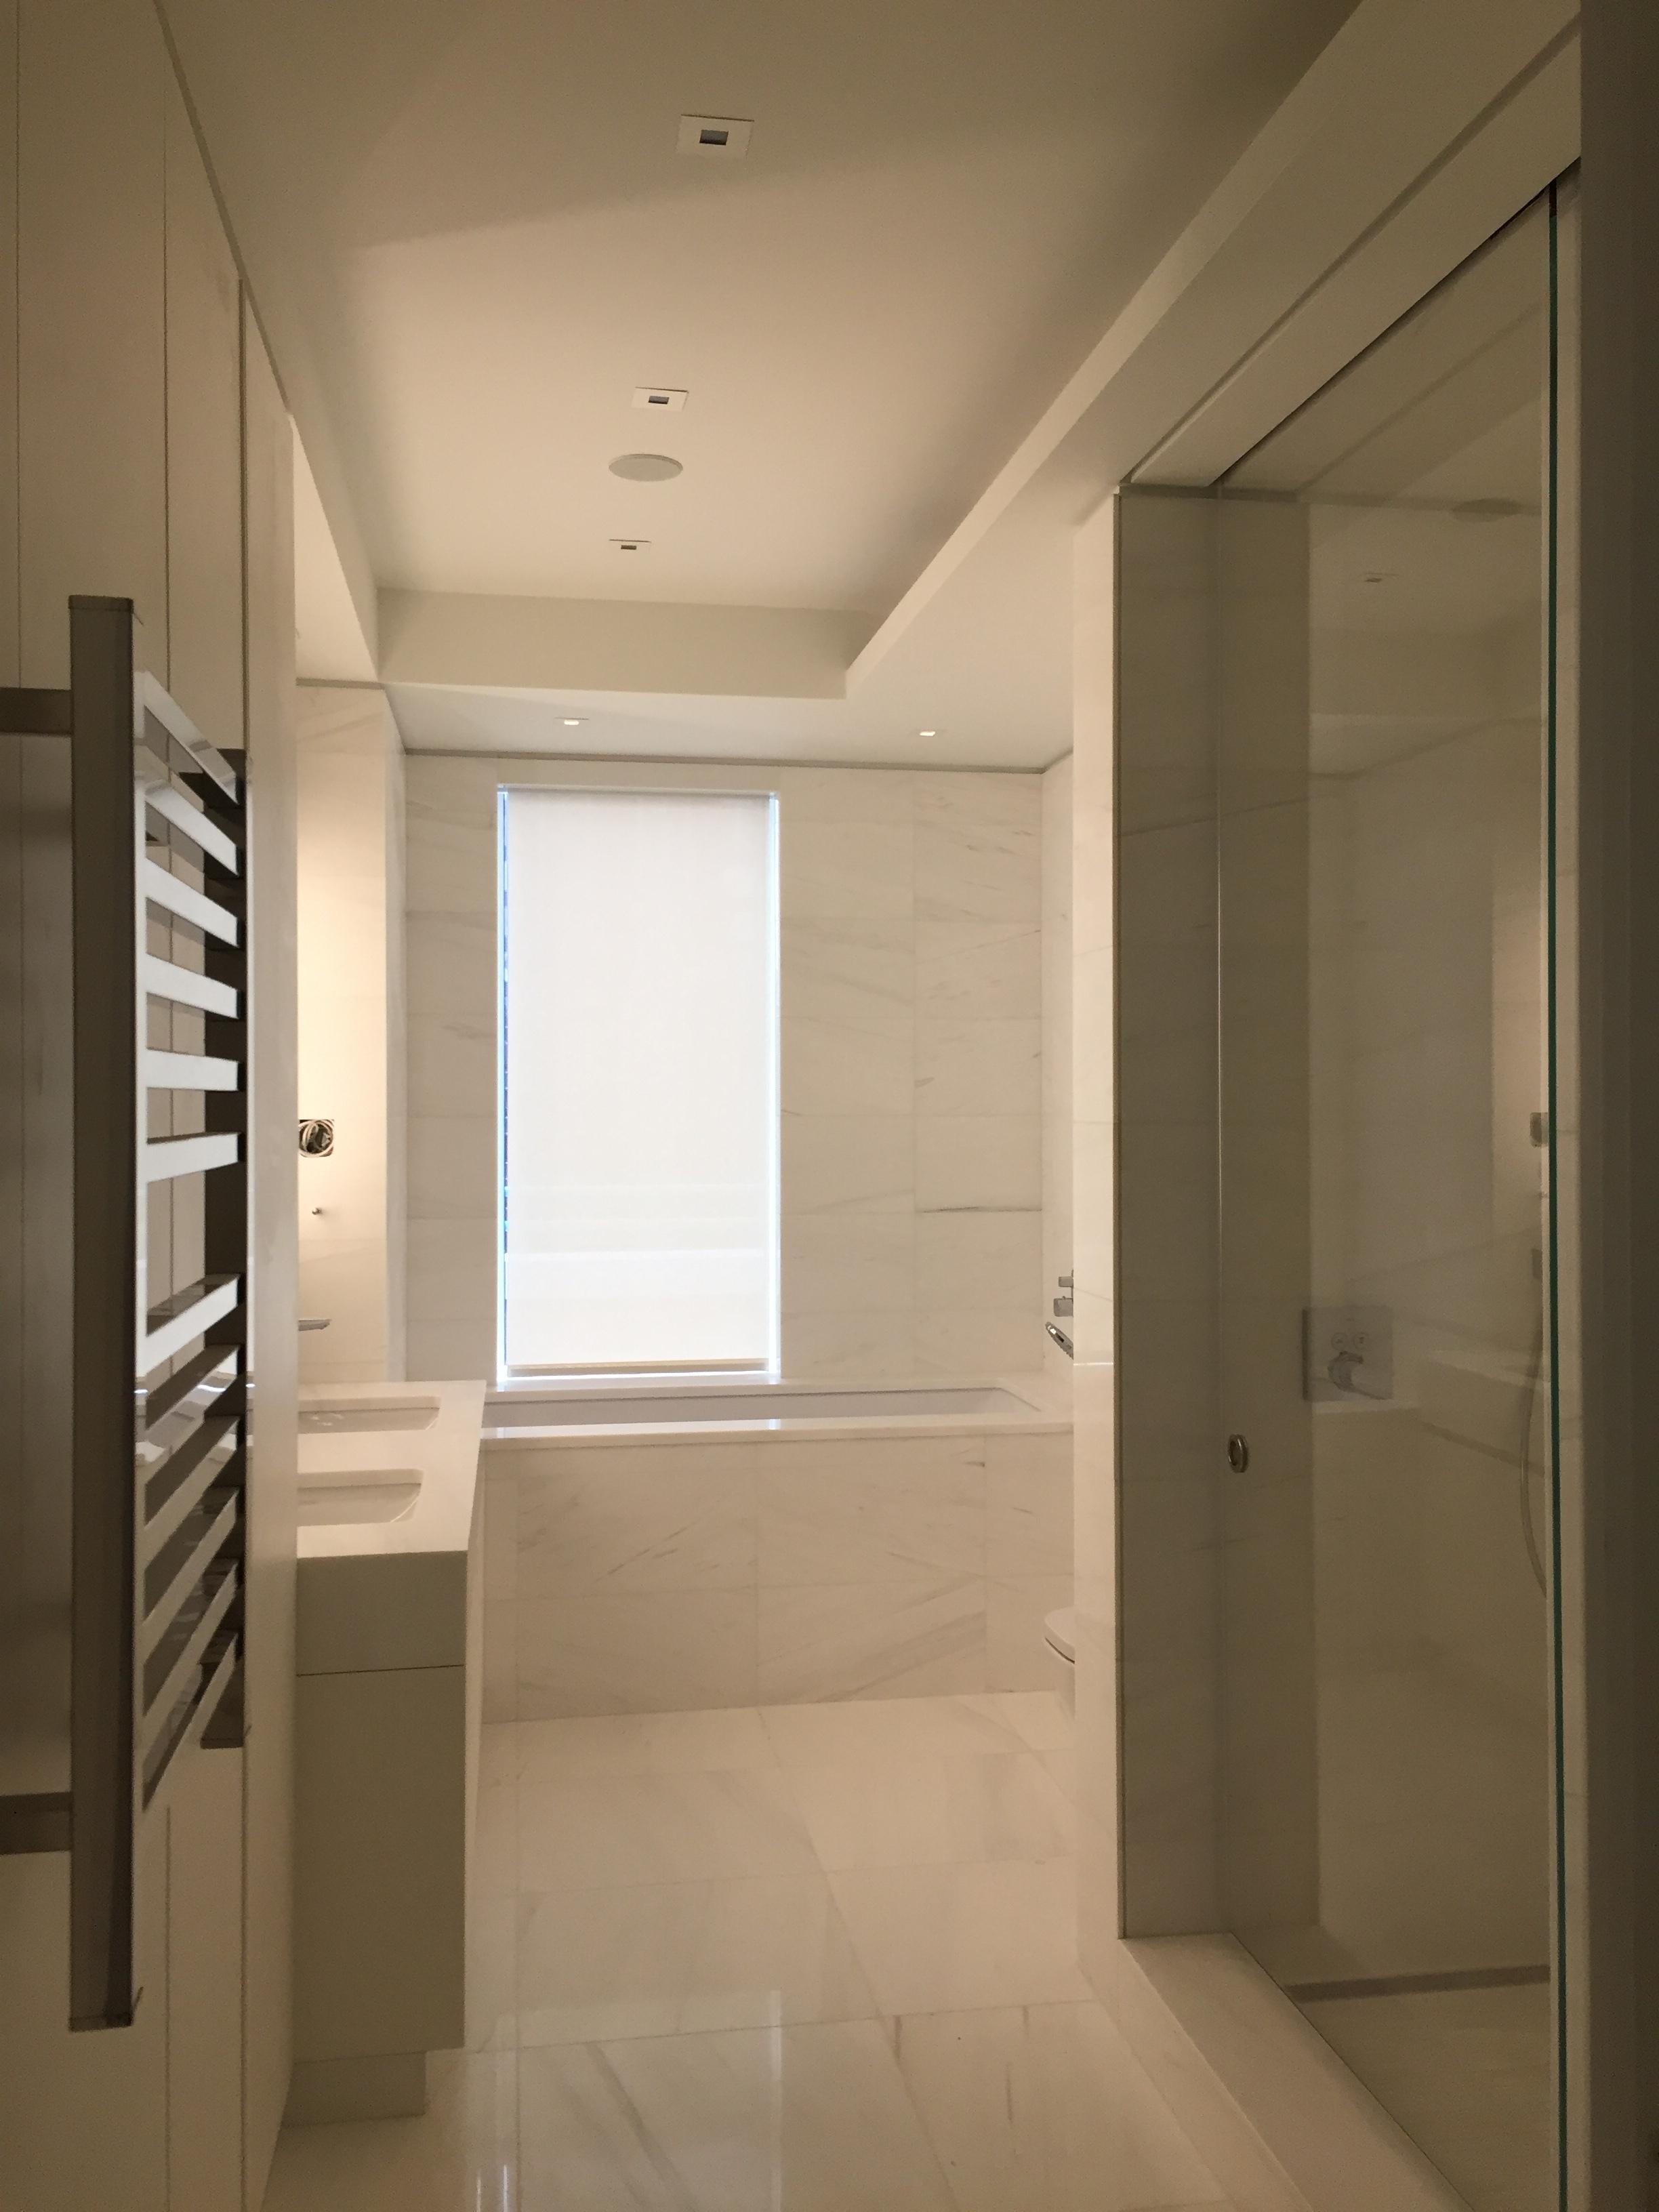 Bathroom Remodeling Jda General Contracting Corp